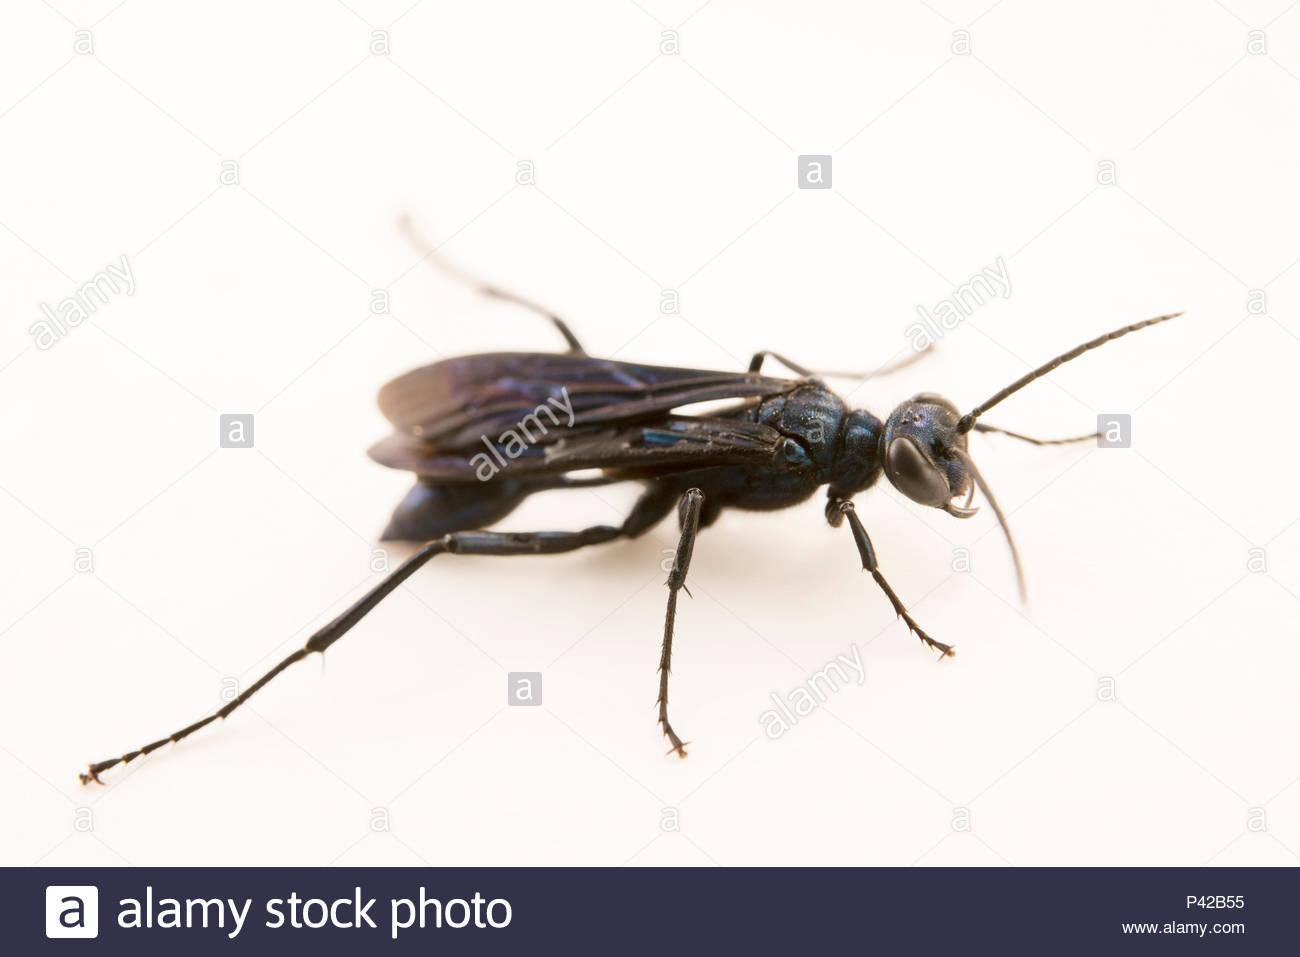 Blue mud dauber wasp, Chalybion californicum, at Cedar Point Biological Station. - Stock Image